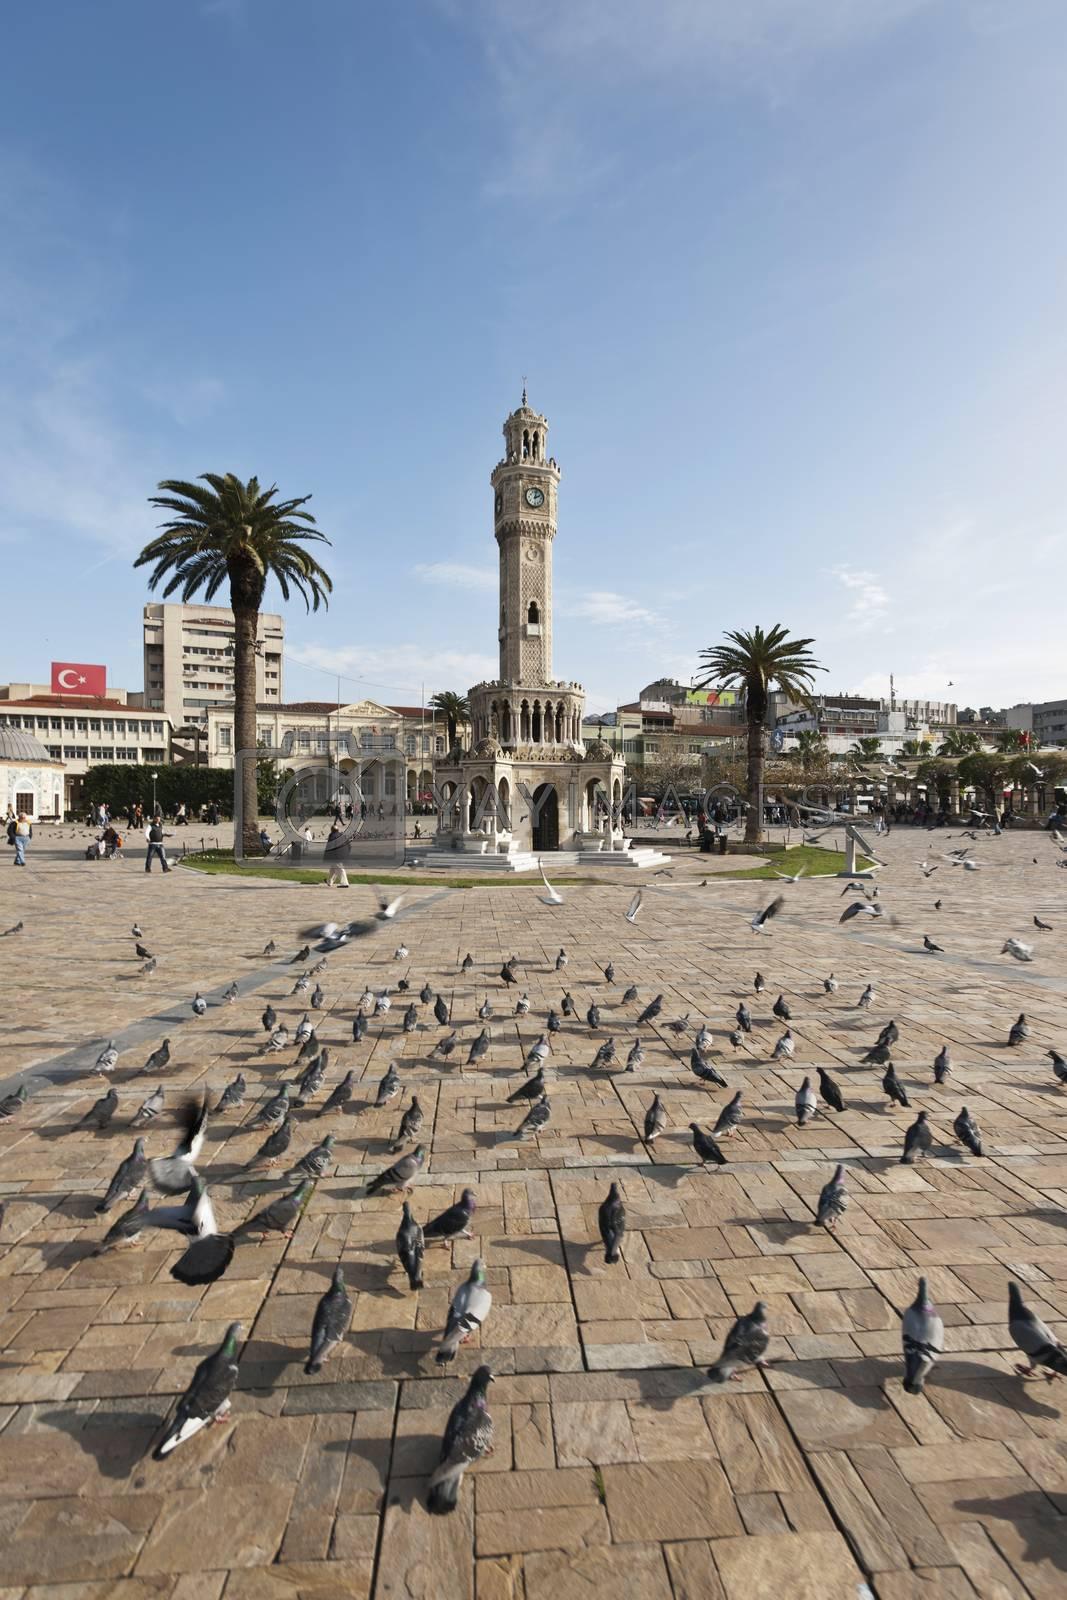 izmir clock tower by emirkoo